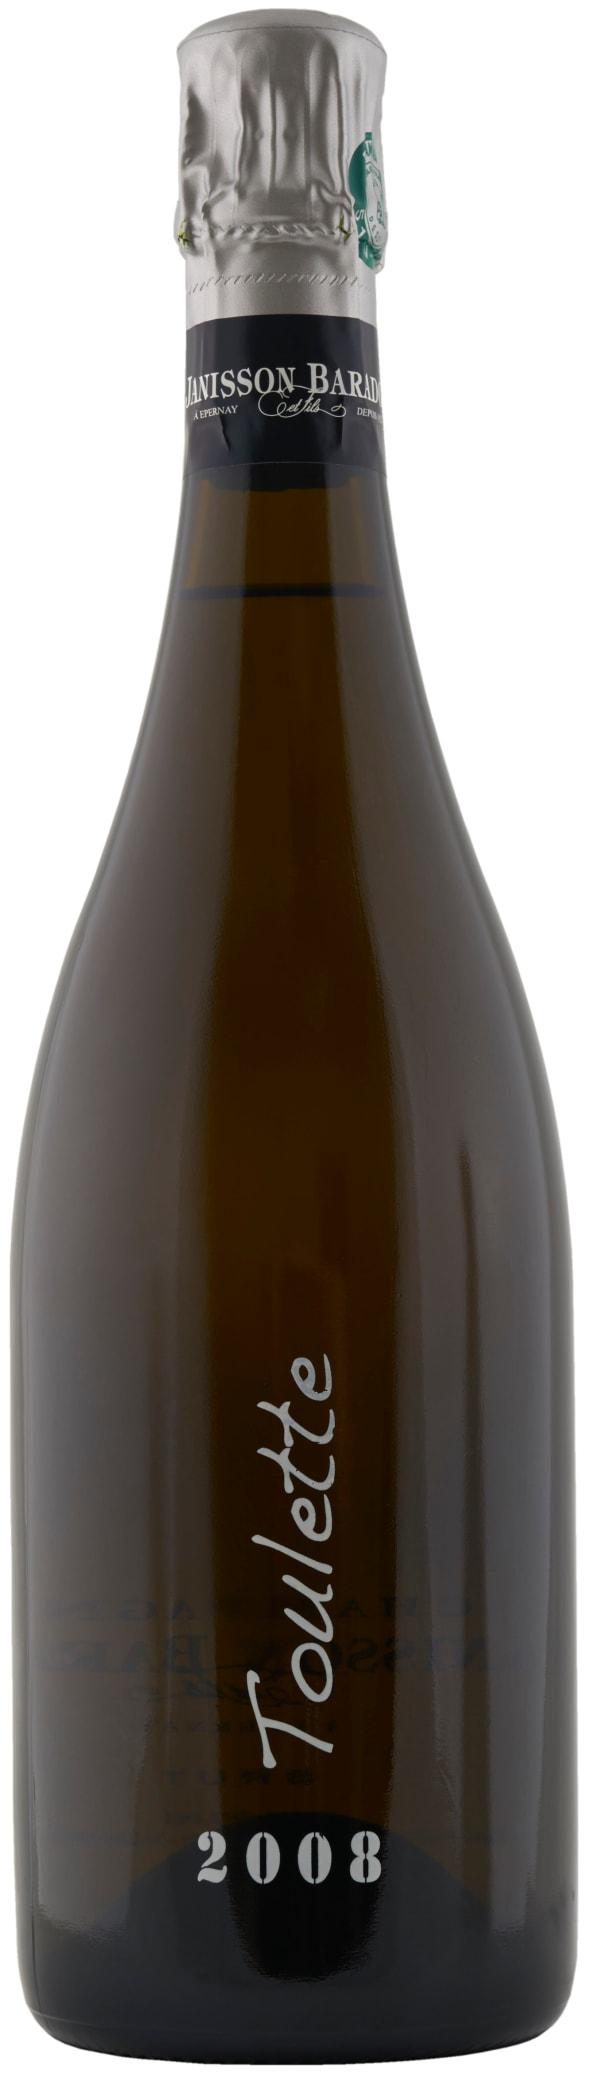 Janisson Baradon Toulette Champagne Brut 2008